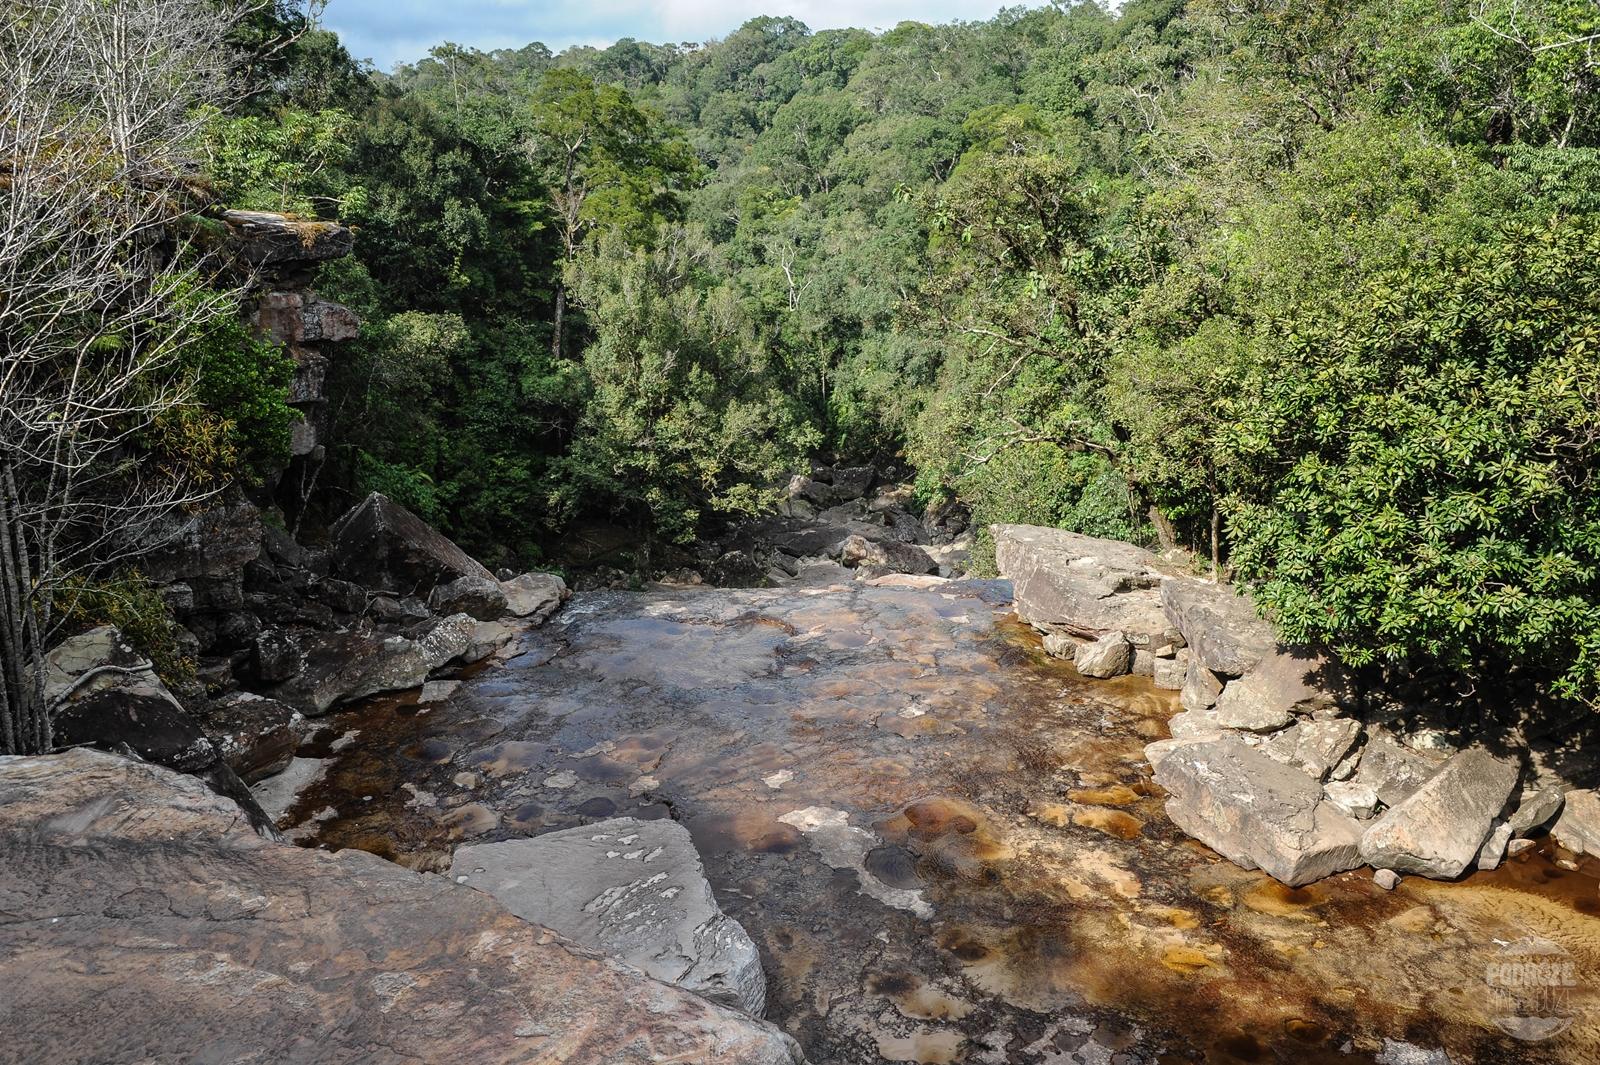 wodospad Popkvil bokor hill station w kambodzy obok kampot